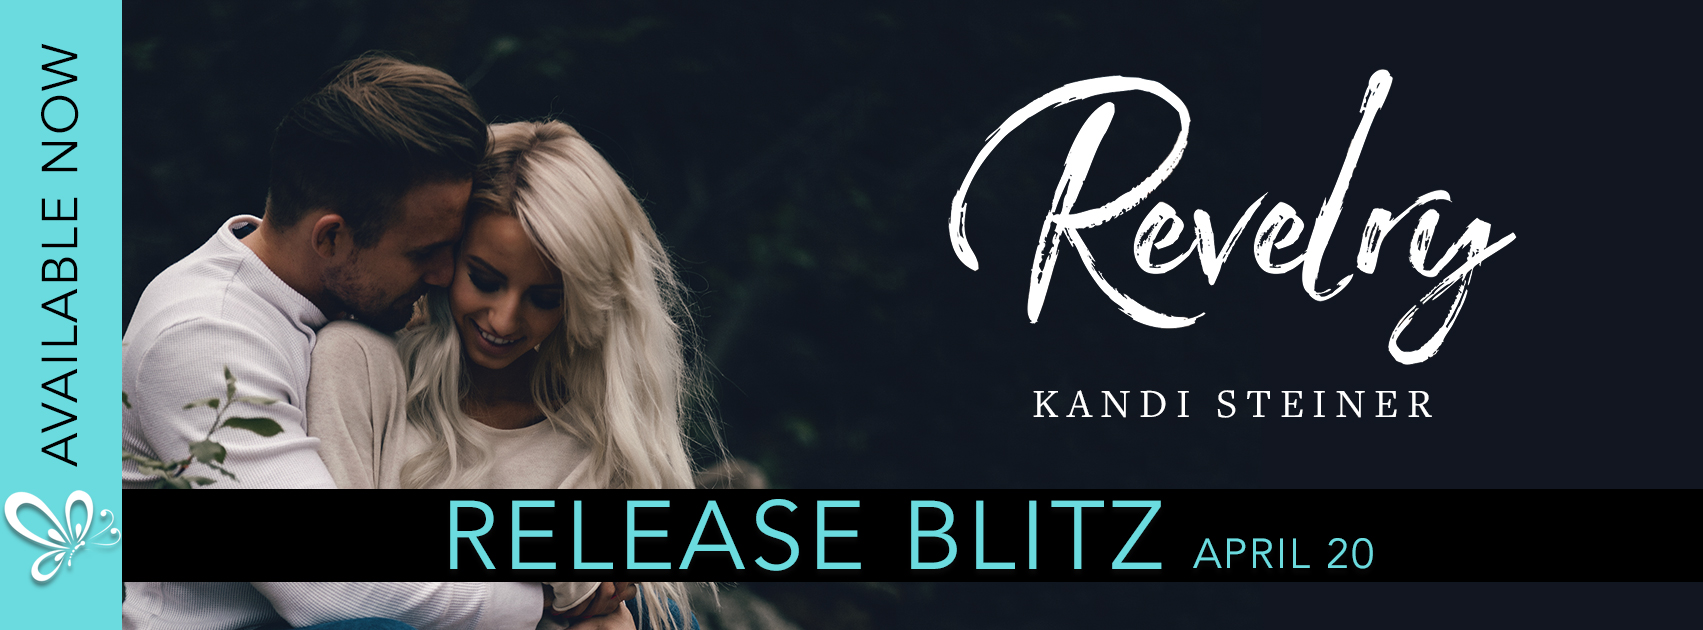 Release Blitz: Revelry by Kandi Steiner